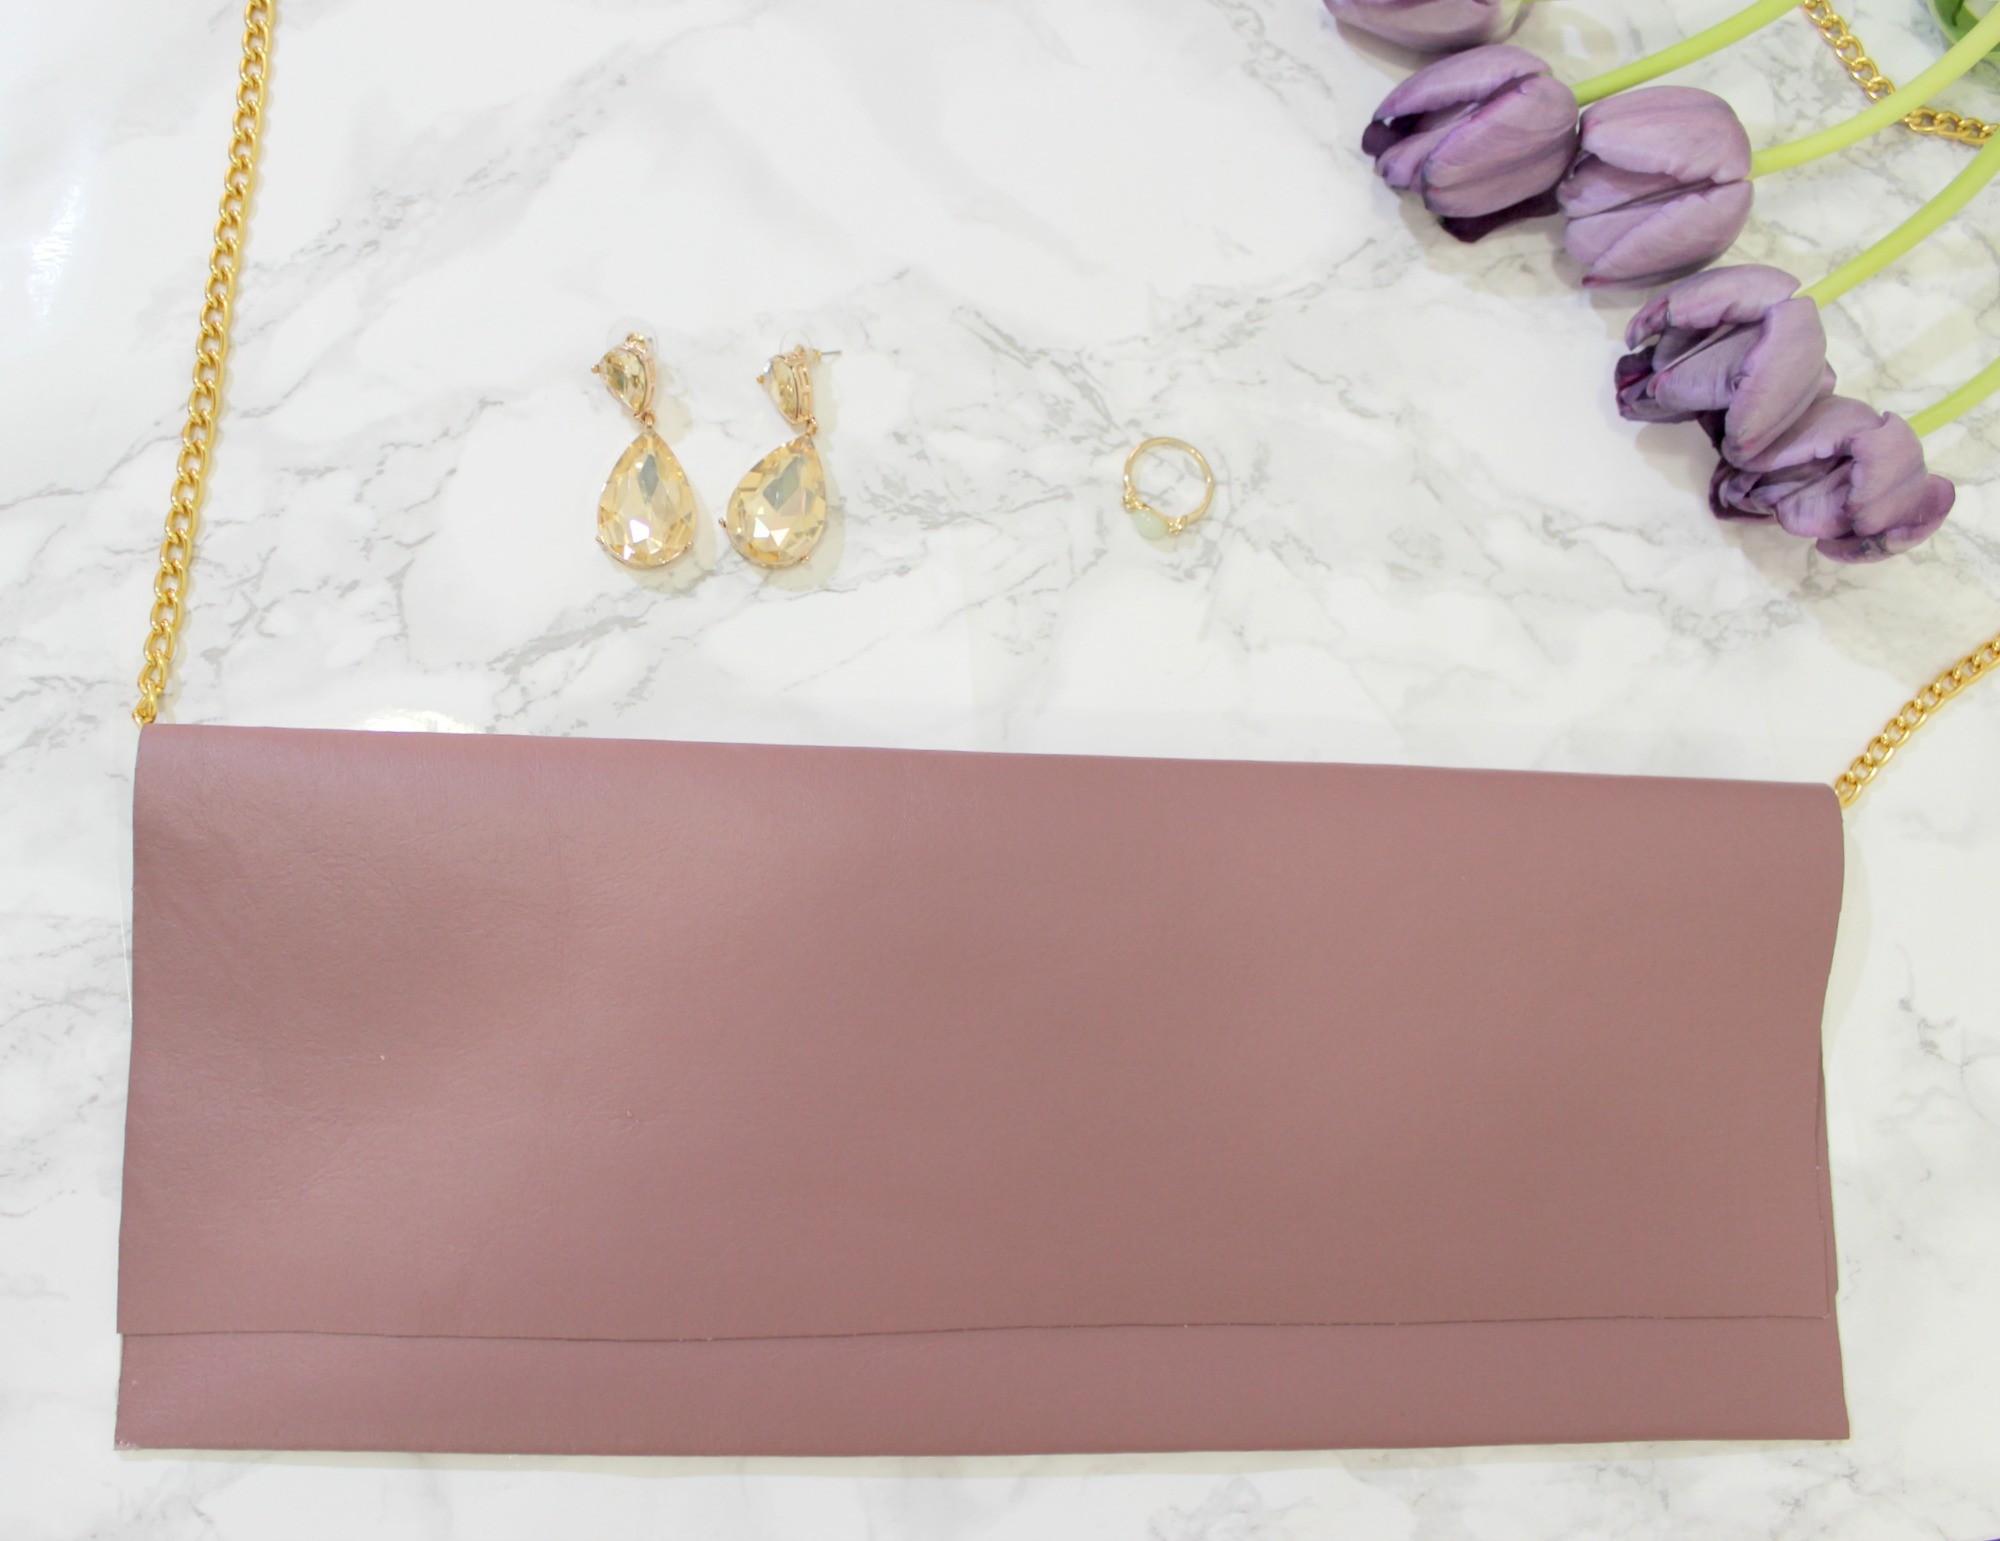 Easy DIY Chain Shoulder Bag Tutorial